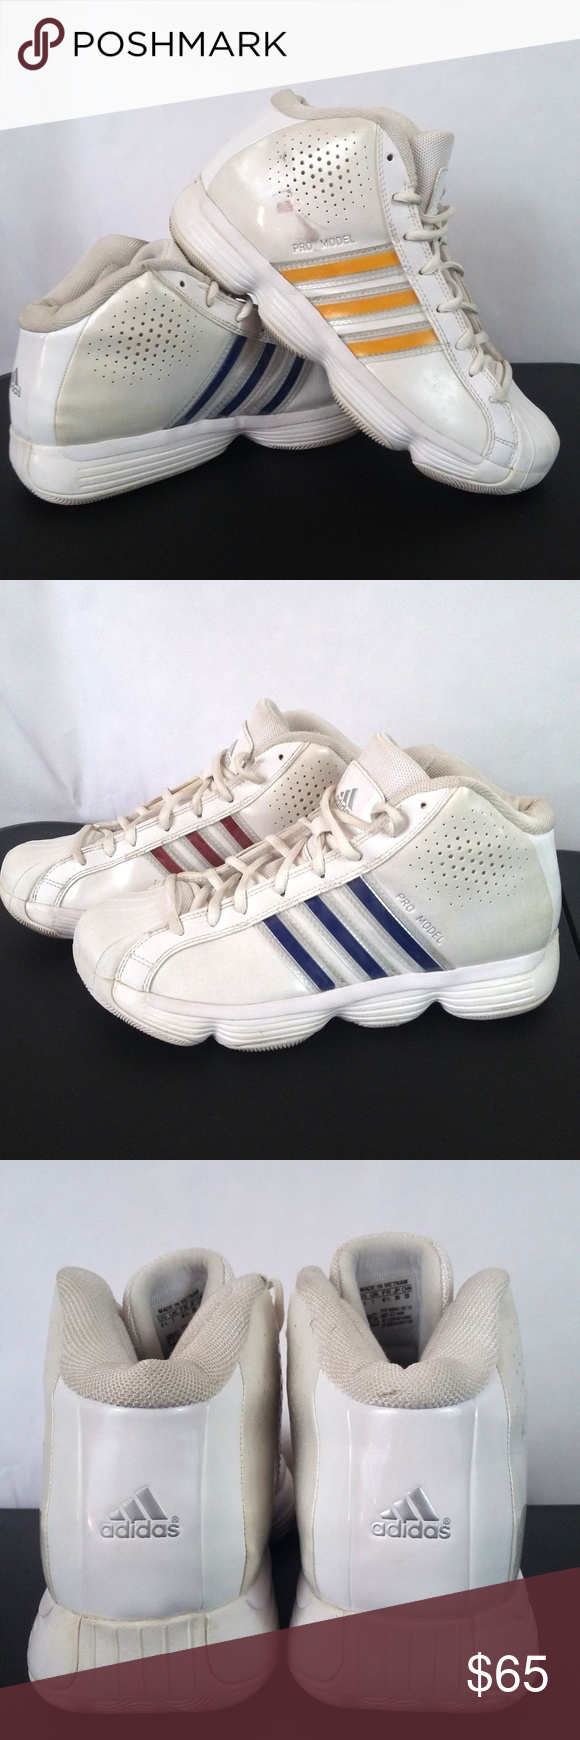 Adidas Pro Model adiPRENE alto - top zapatos adidas Pro Model hombre 's size